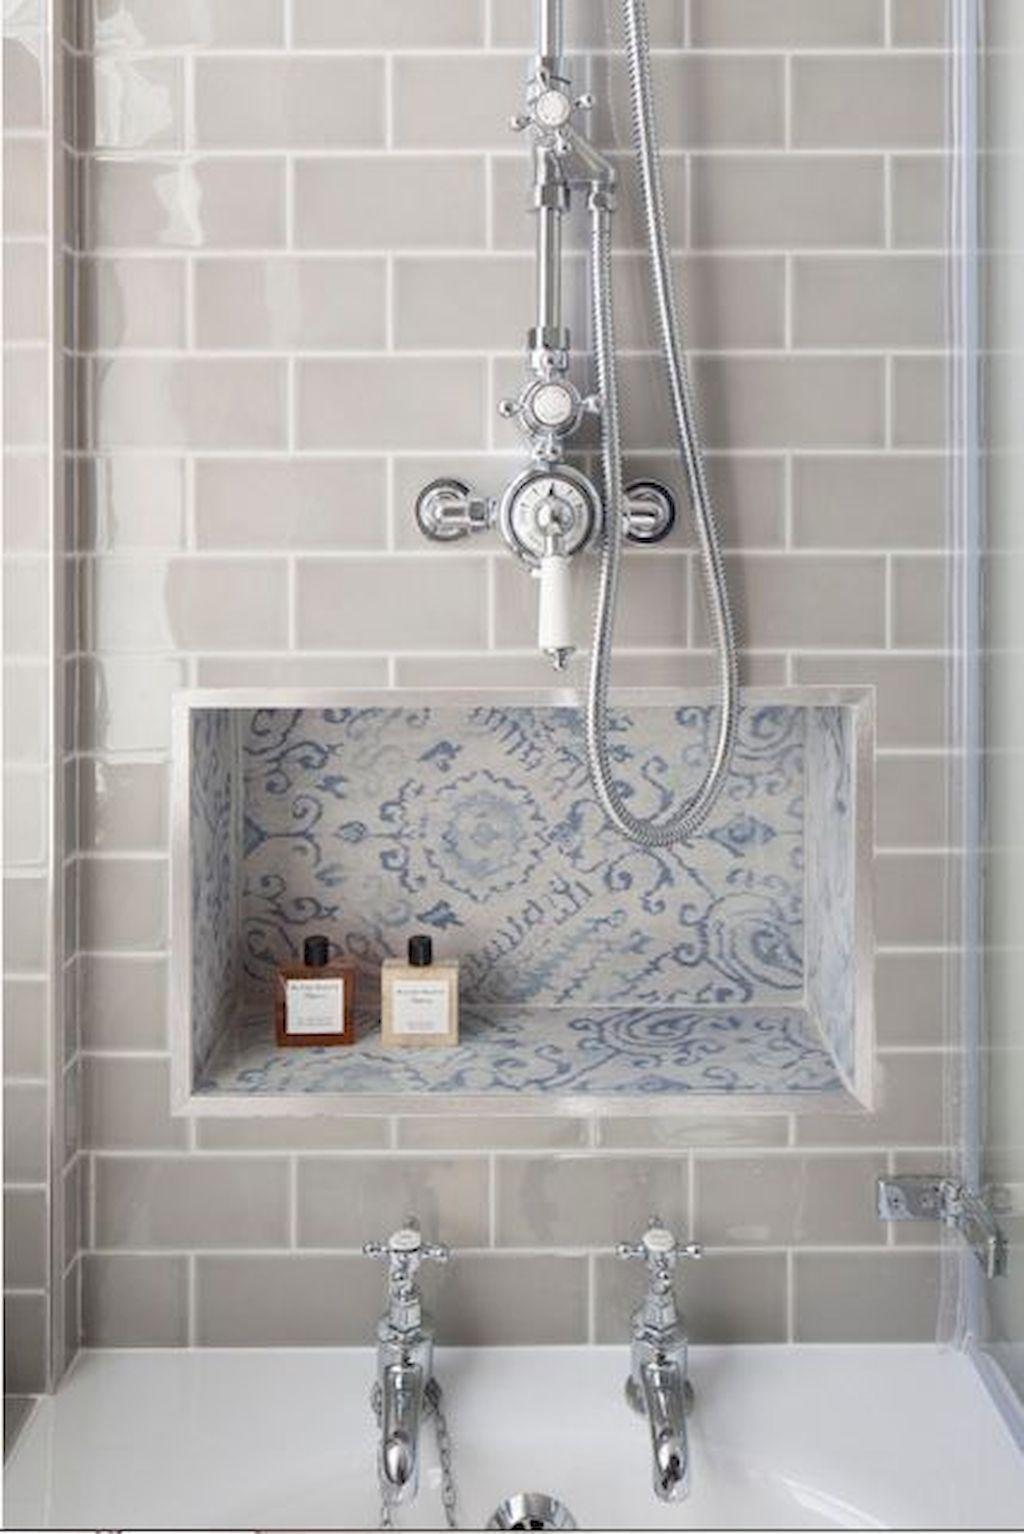 55 Inspiration Bathroom Tile Pattern Decorating Ideas | Pinterest ...